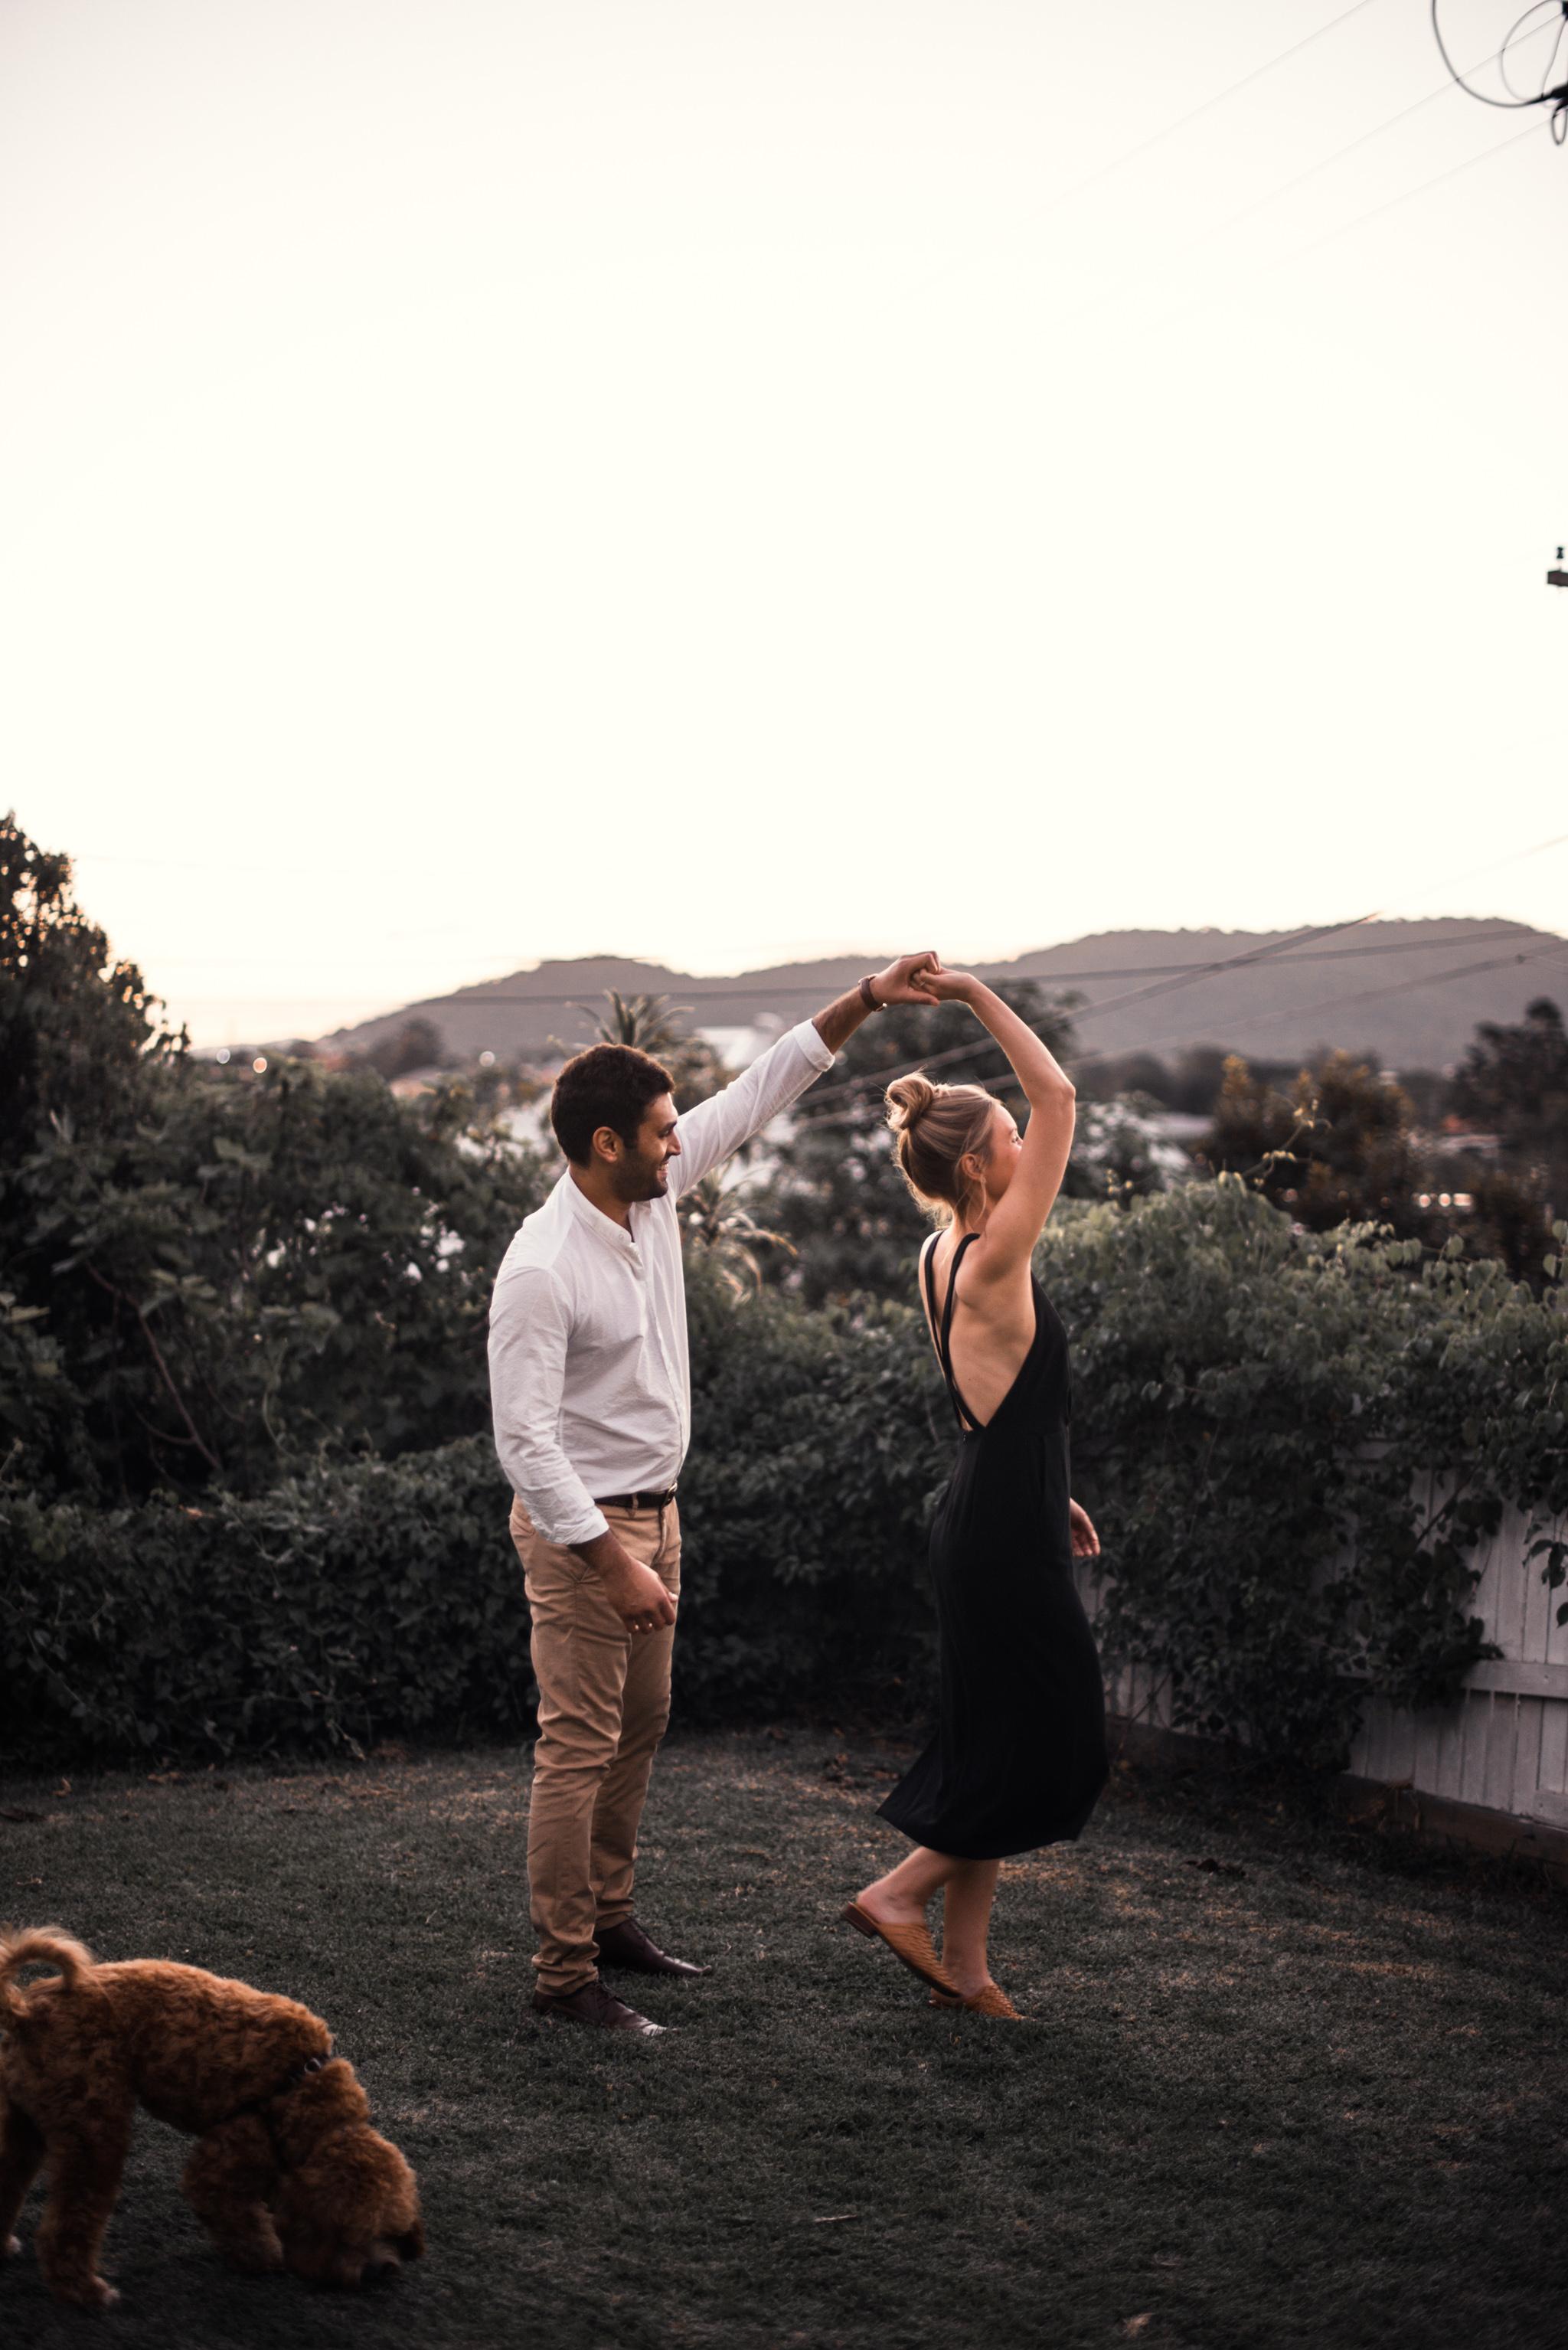 LOVELENSCAPES PHOTOGRAPHY • VISUAL POETRY • SOPHIA & VIJAY'S ENGAGEMENT • 31.jpg